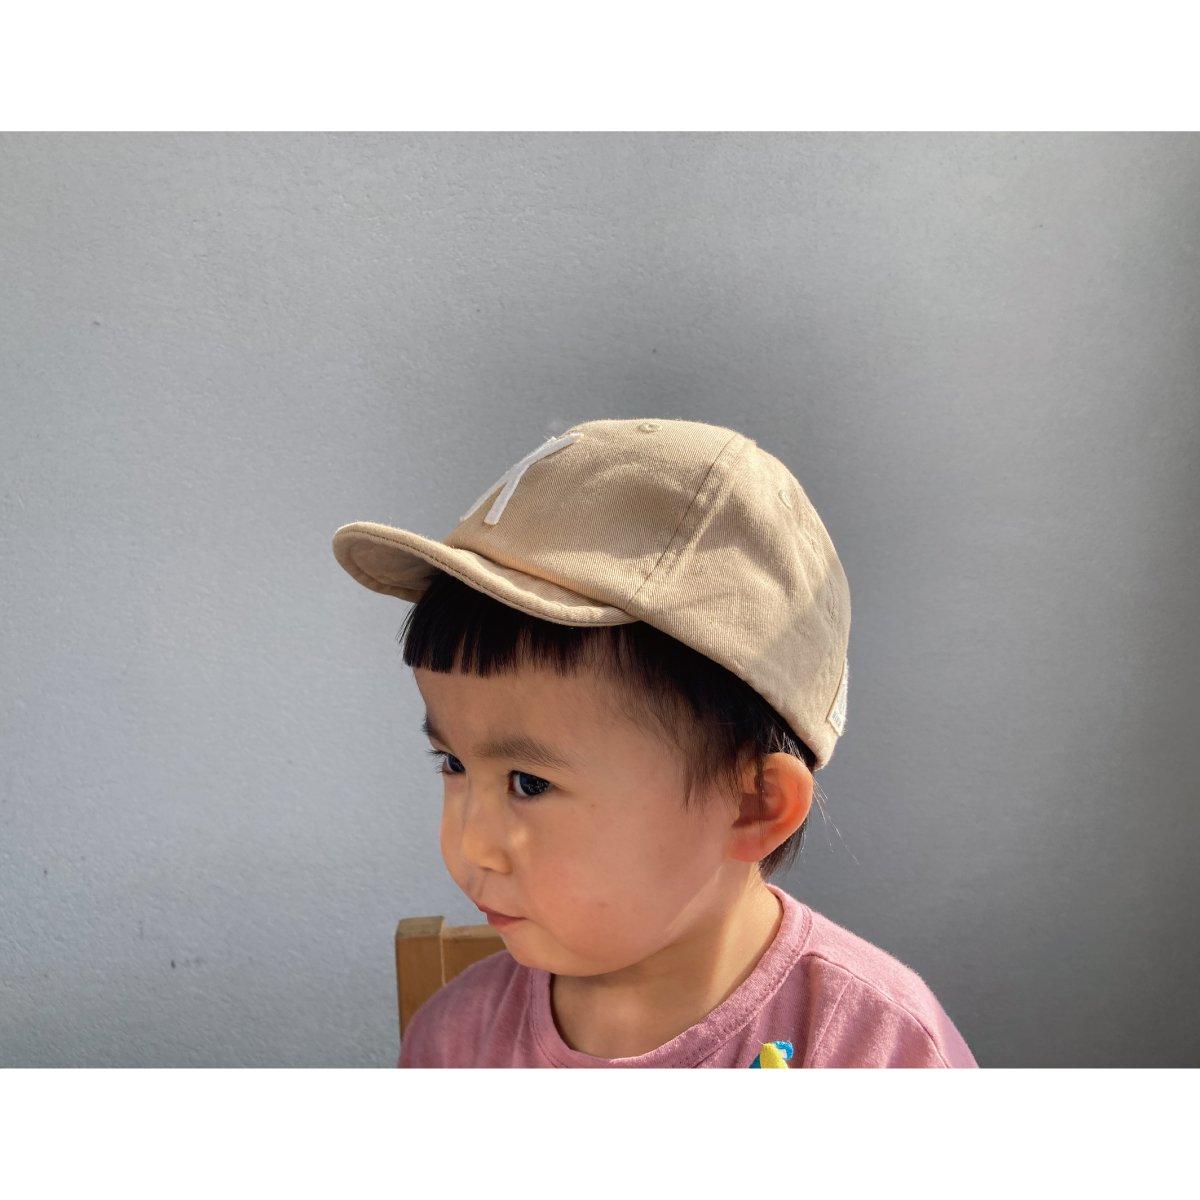 【KIDS】Kids Sim Logo Cap 詳細画像37